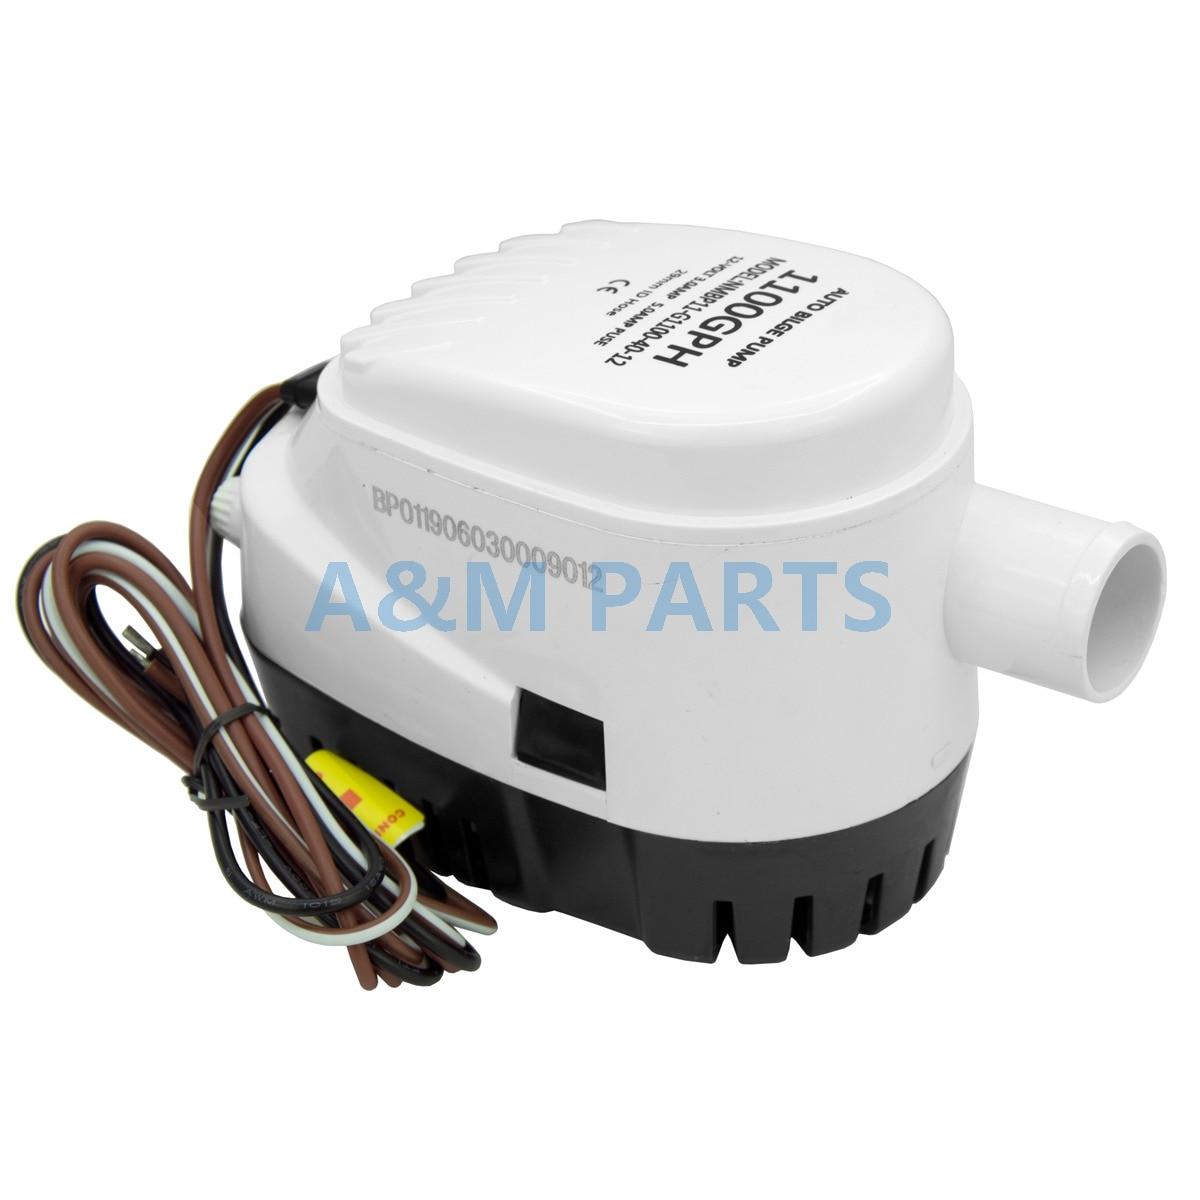 12V 1100GPH Marine Boat Automatic Bilge Pump RV Auto Submersible Water Pump